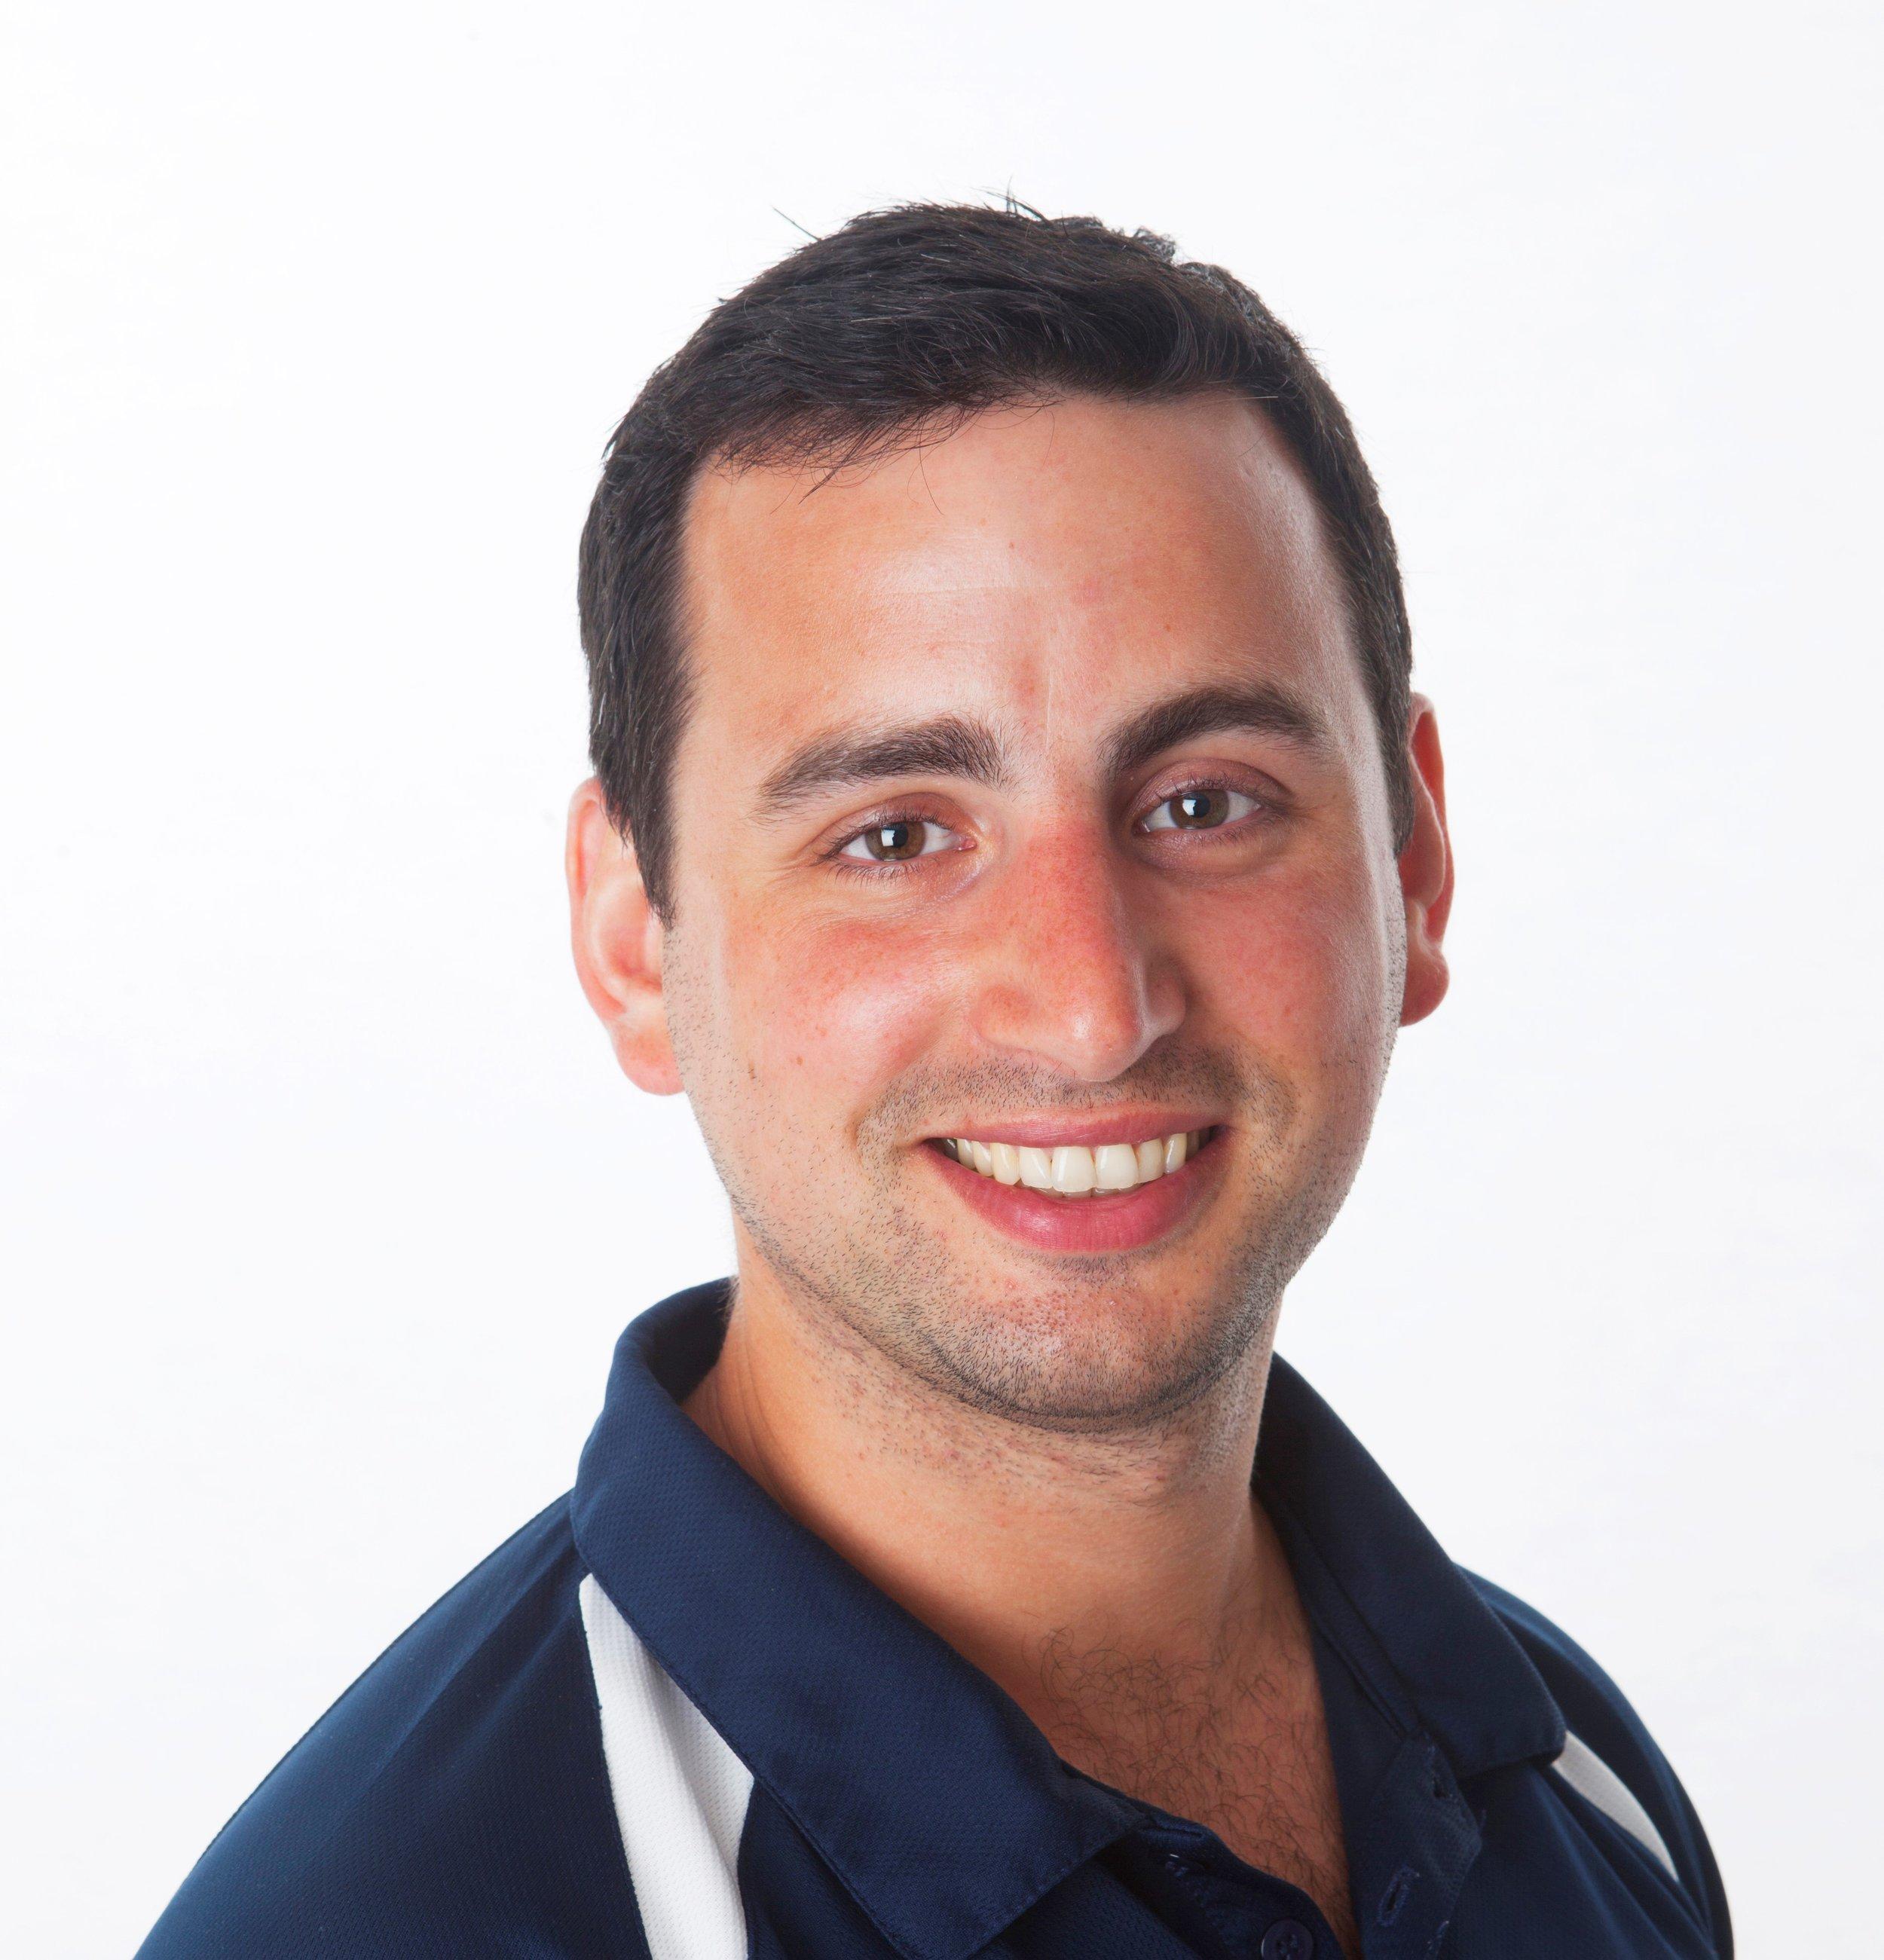 Patrick Kenny - Owner